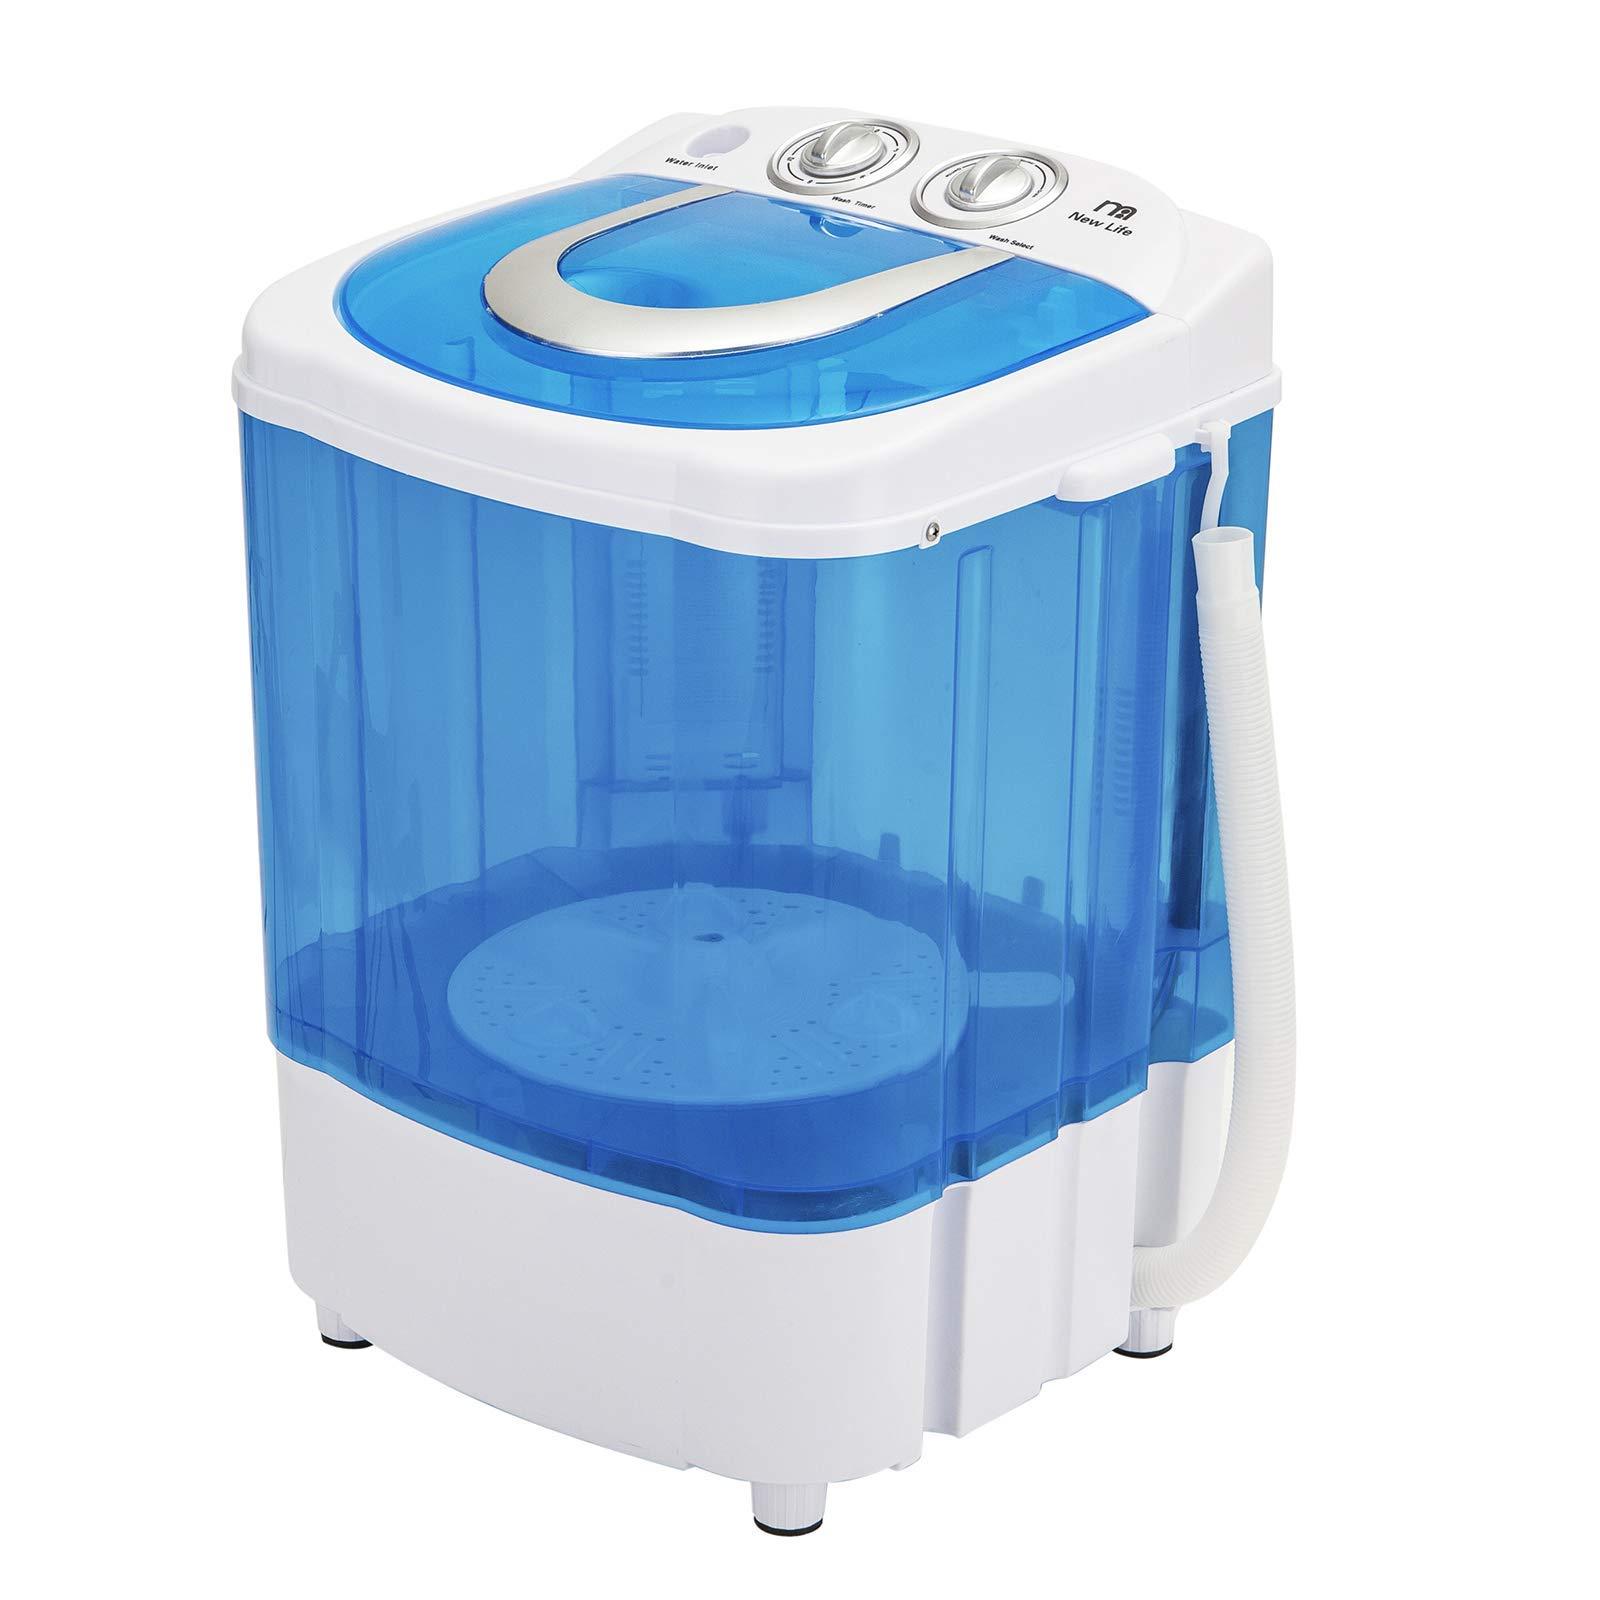 Mini Portable Washing Machine, 10lbs Capacity, Small Semi-Automatic, MUMU New Life Single Tub Compact Washer with Timer Control